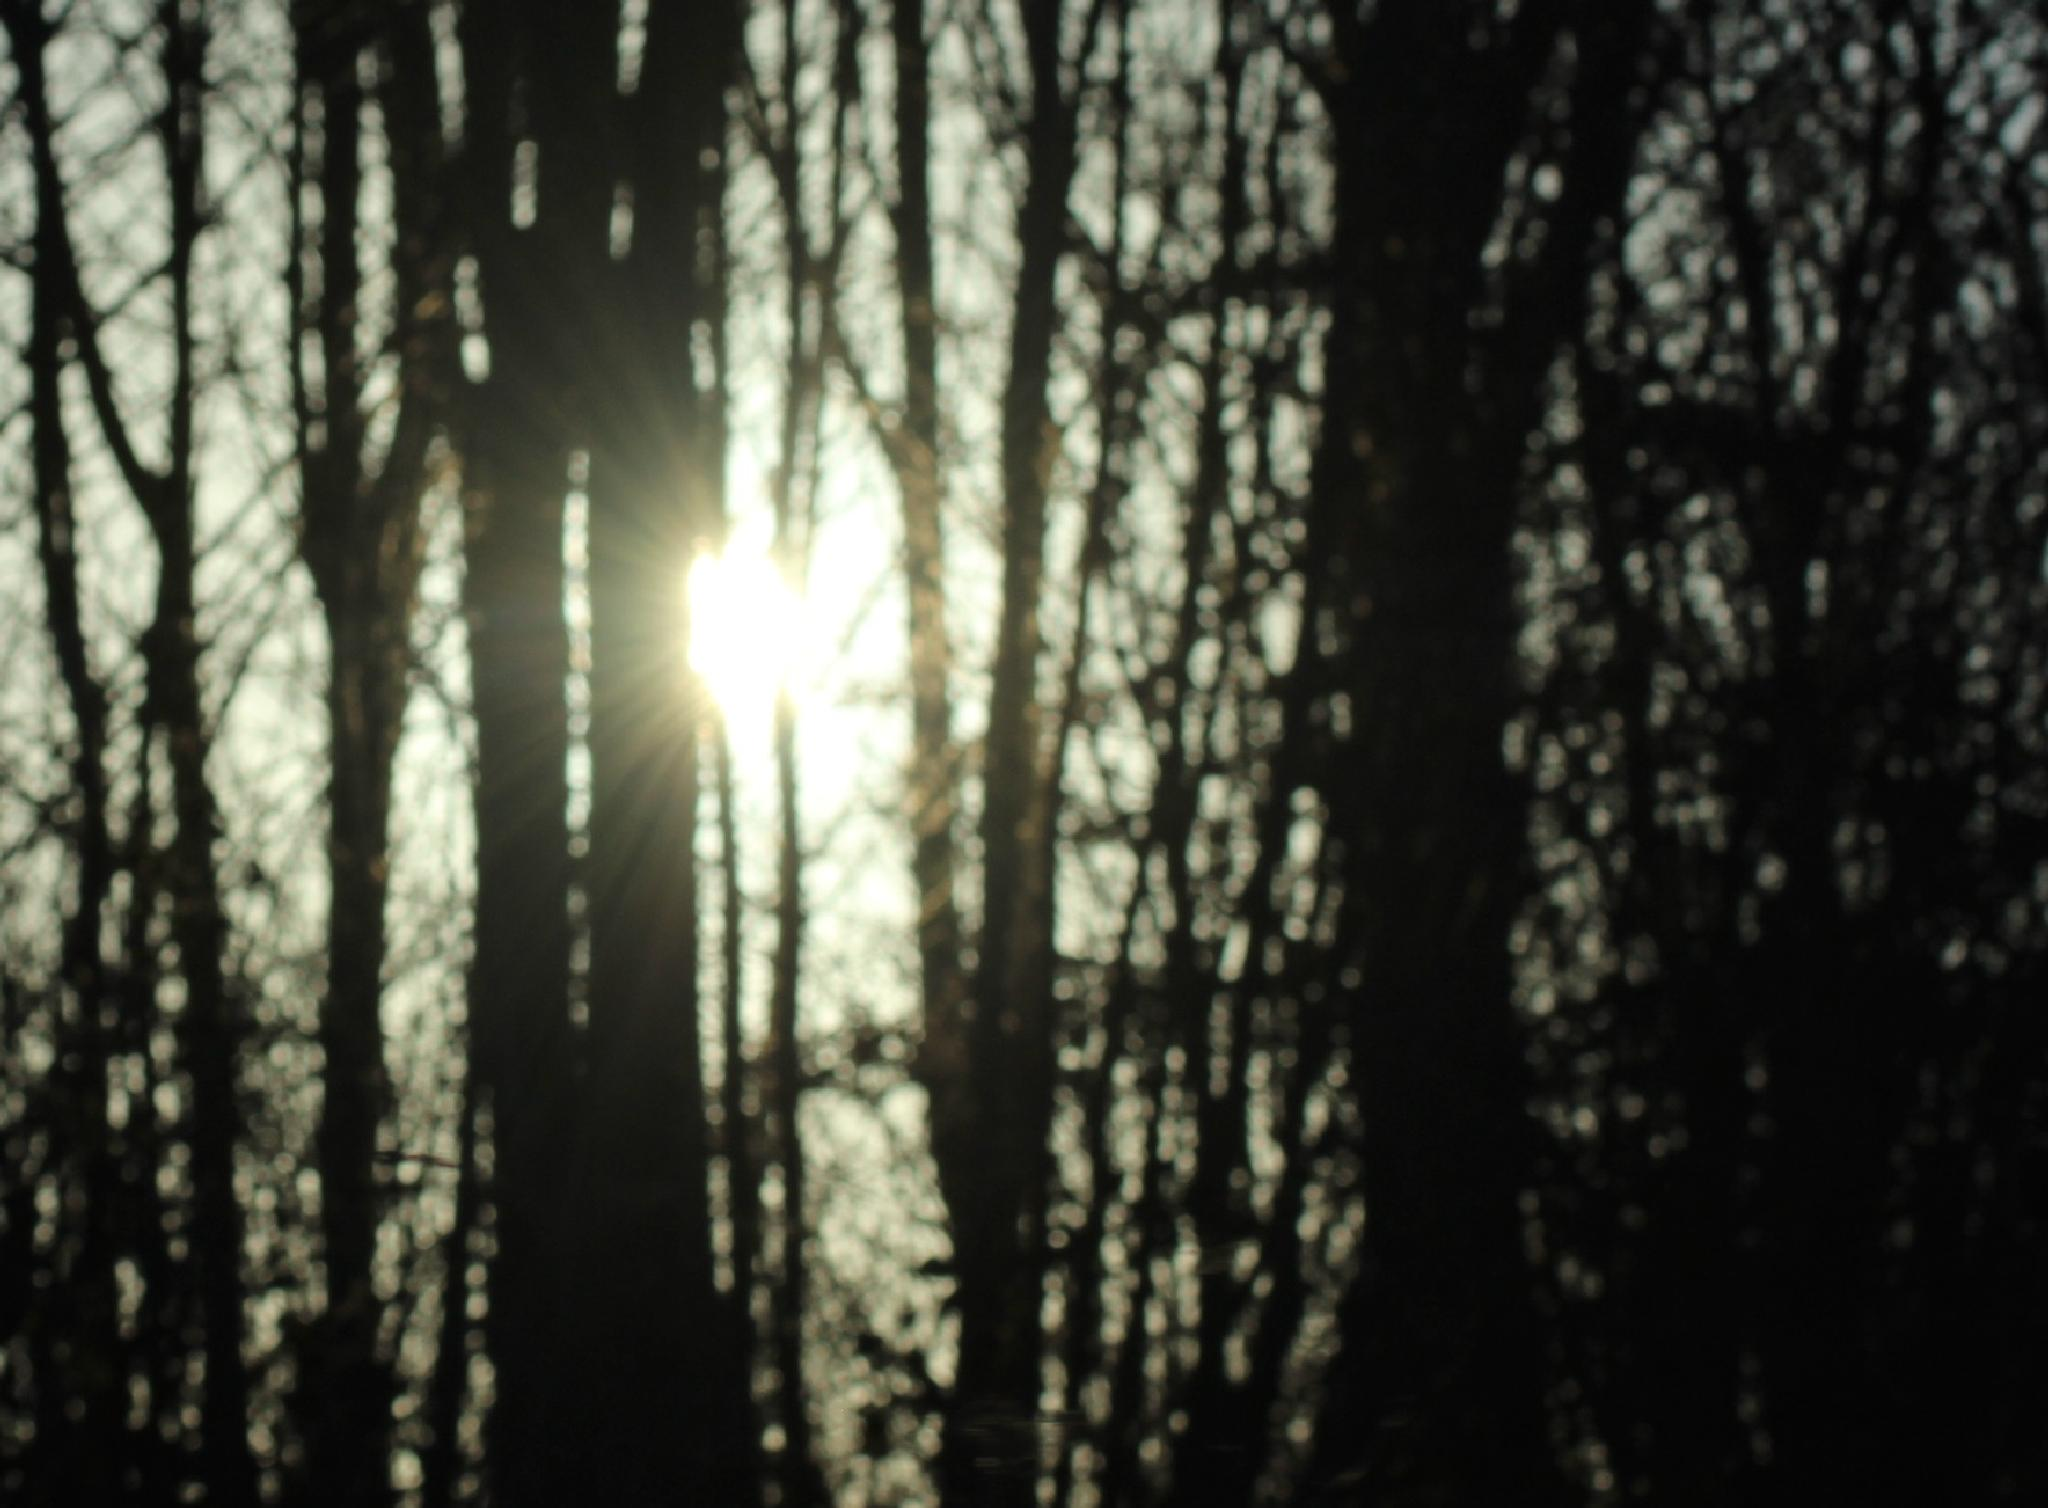 Goonight sun by denise.cicchella